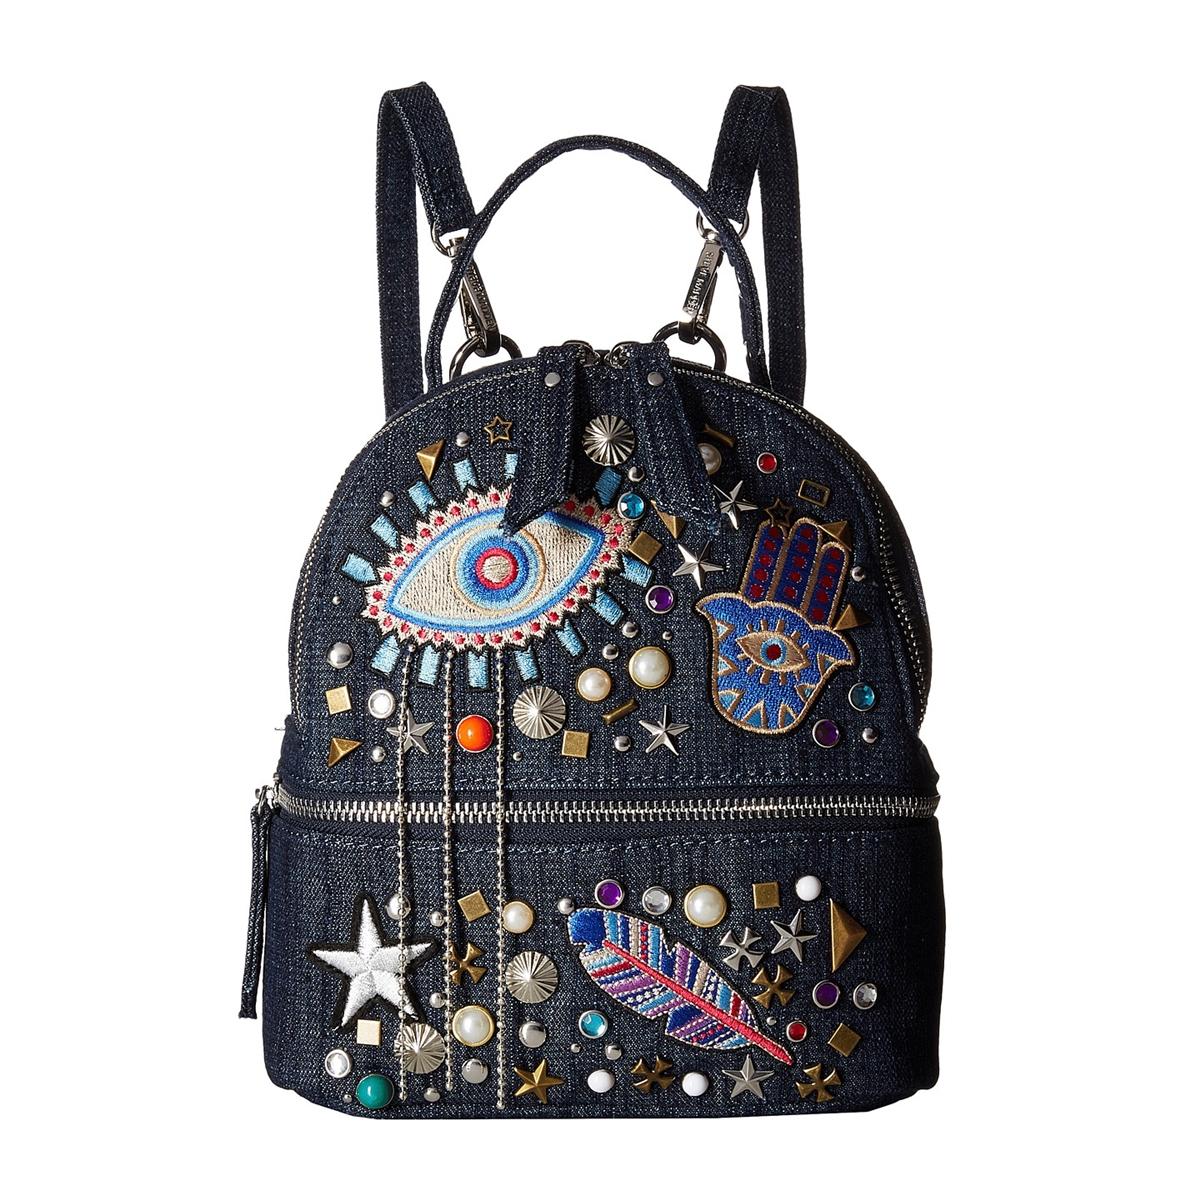 Steve Madden B Tasha Stud Amp Patch Mini Backpack Denim